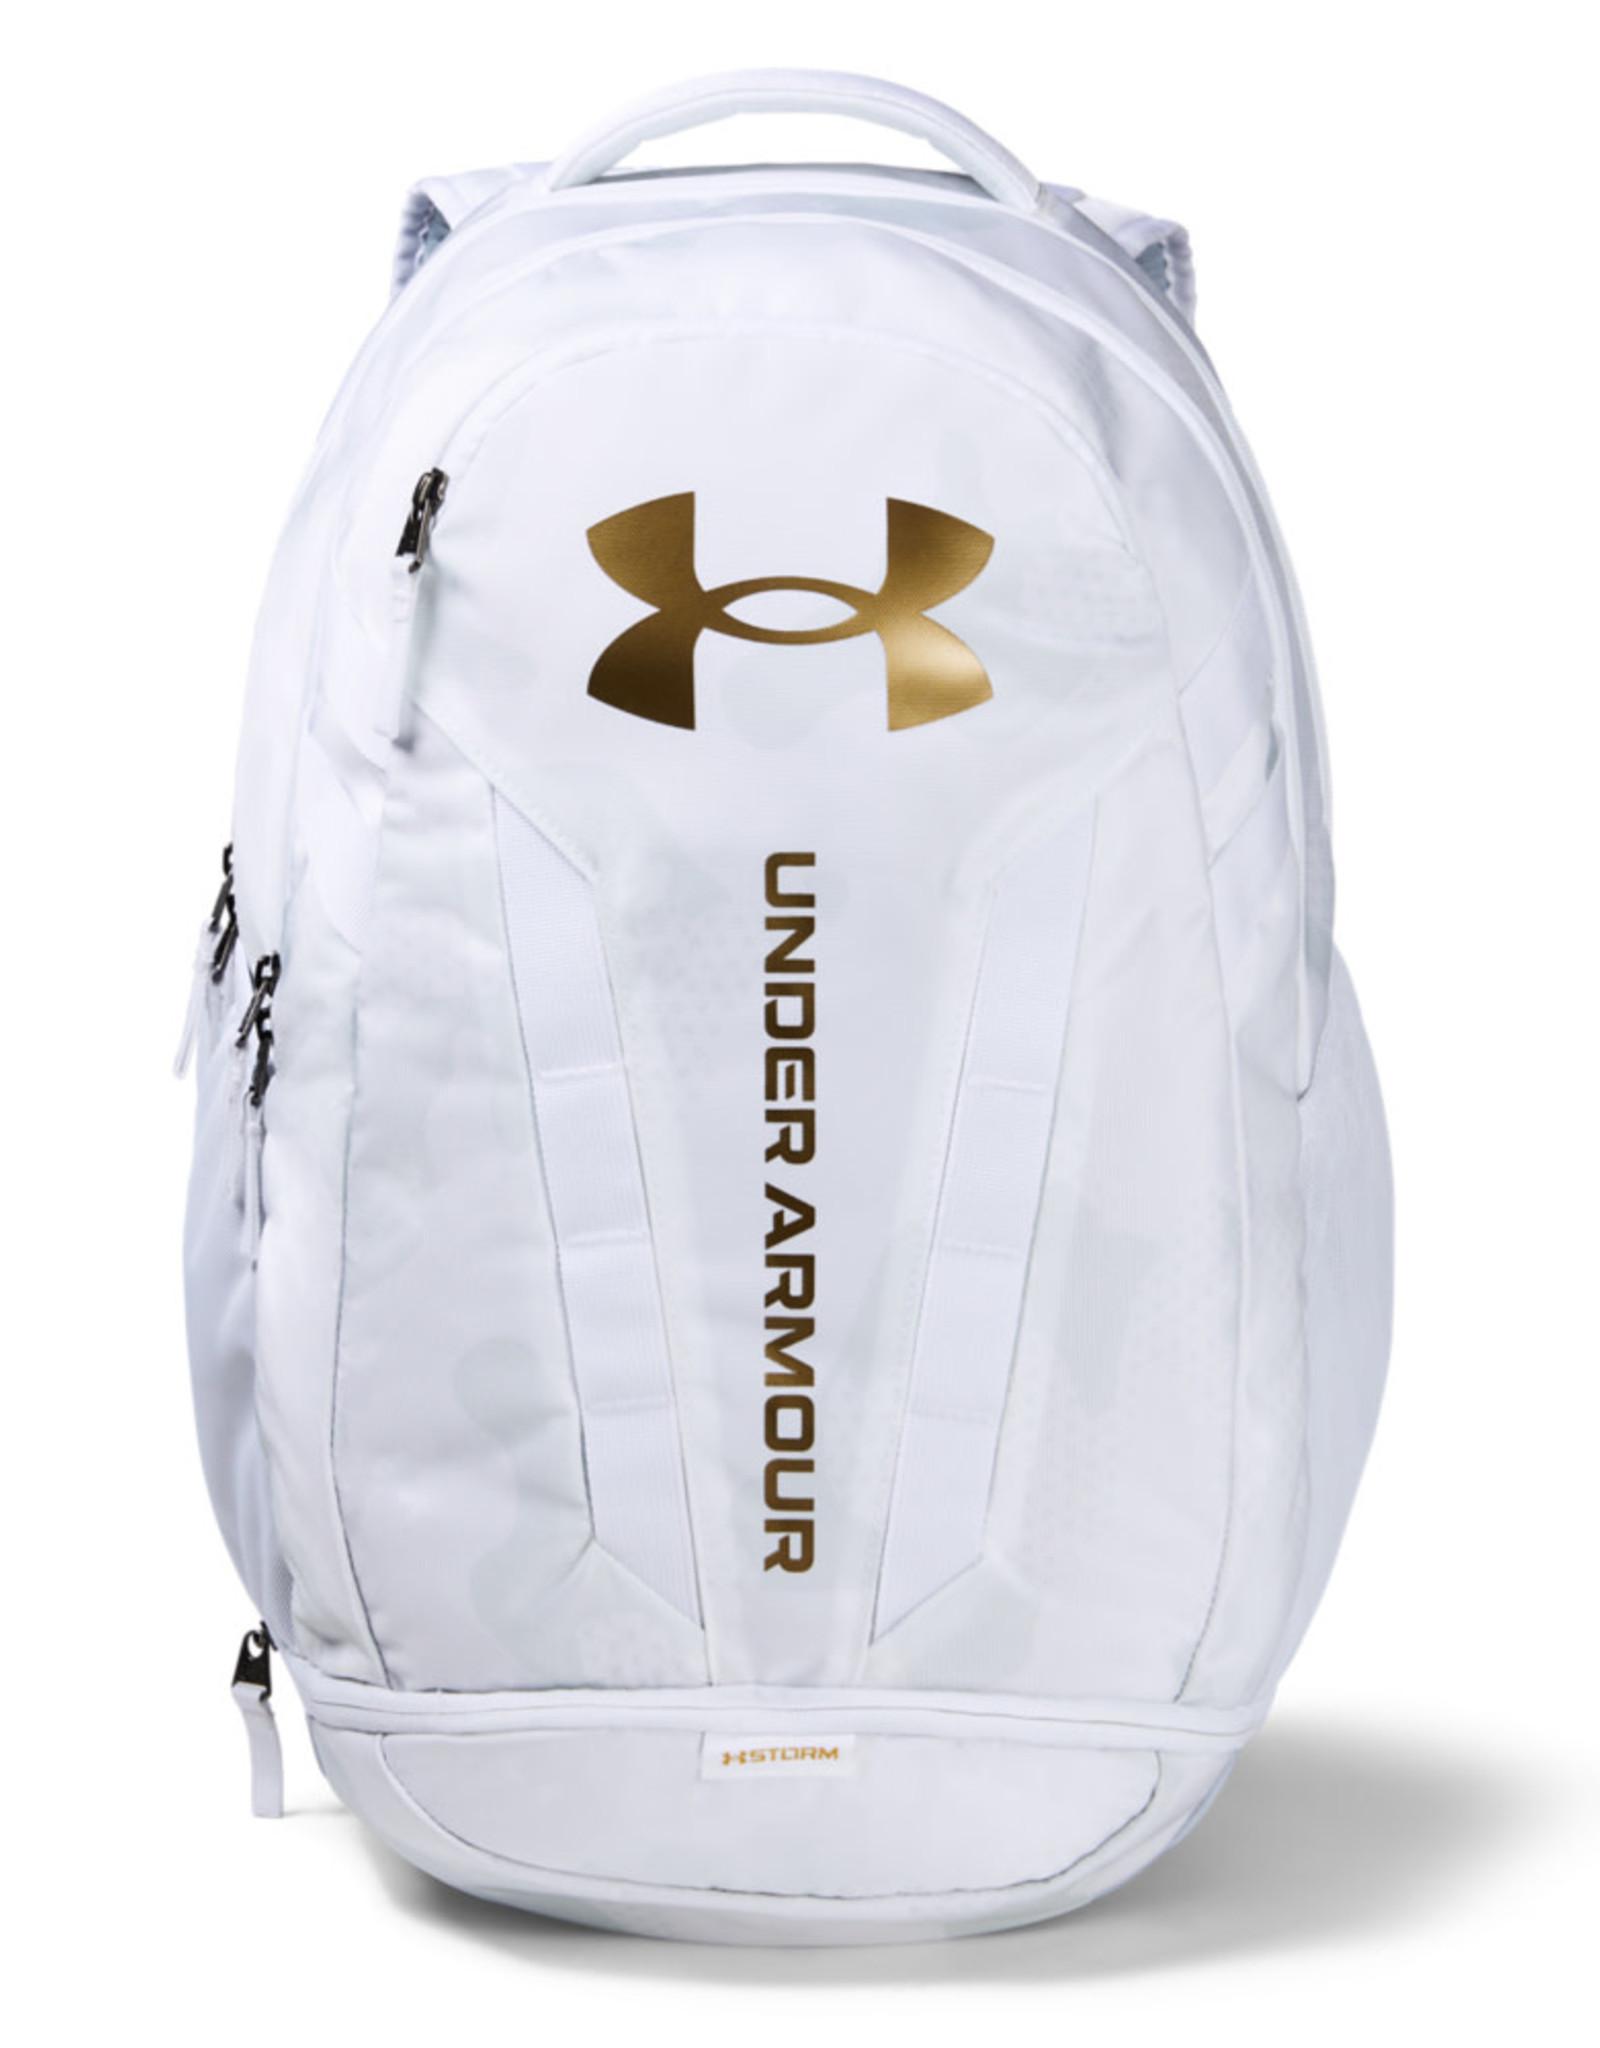 Under Armour UA Hustle 5.0 Backpack - White-Mod Gray-Metallic Gold Luster - OSFA